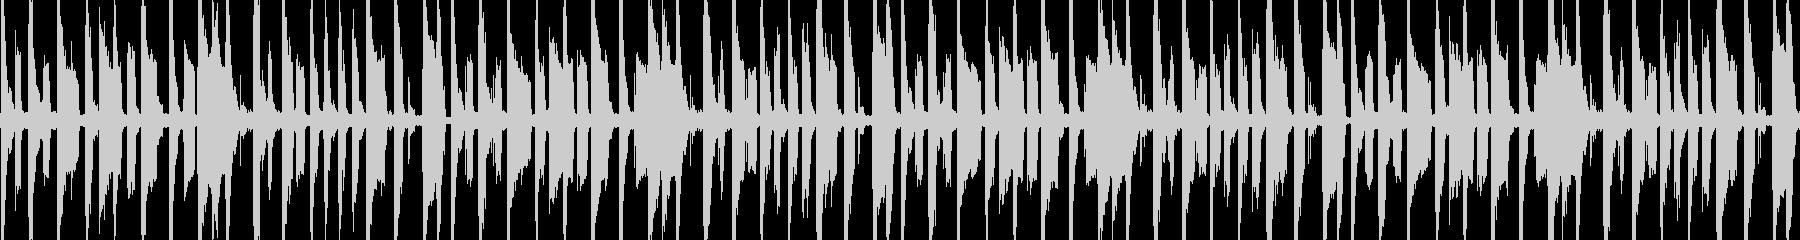 Laidback reggae t...'s unreproduced waveform